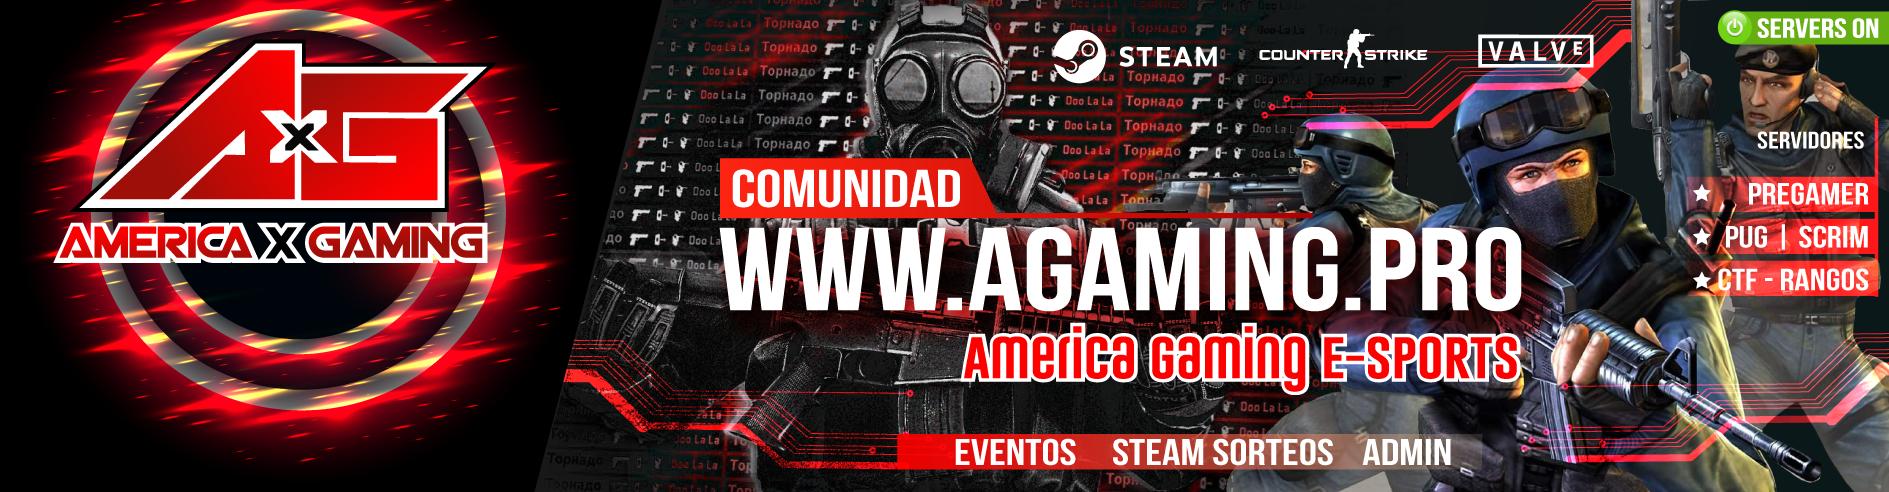 America Gaming | E-SPORTS